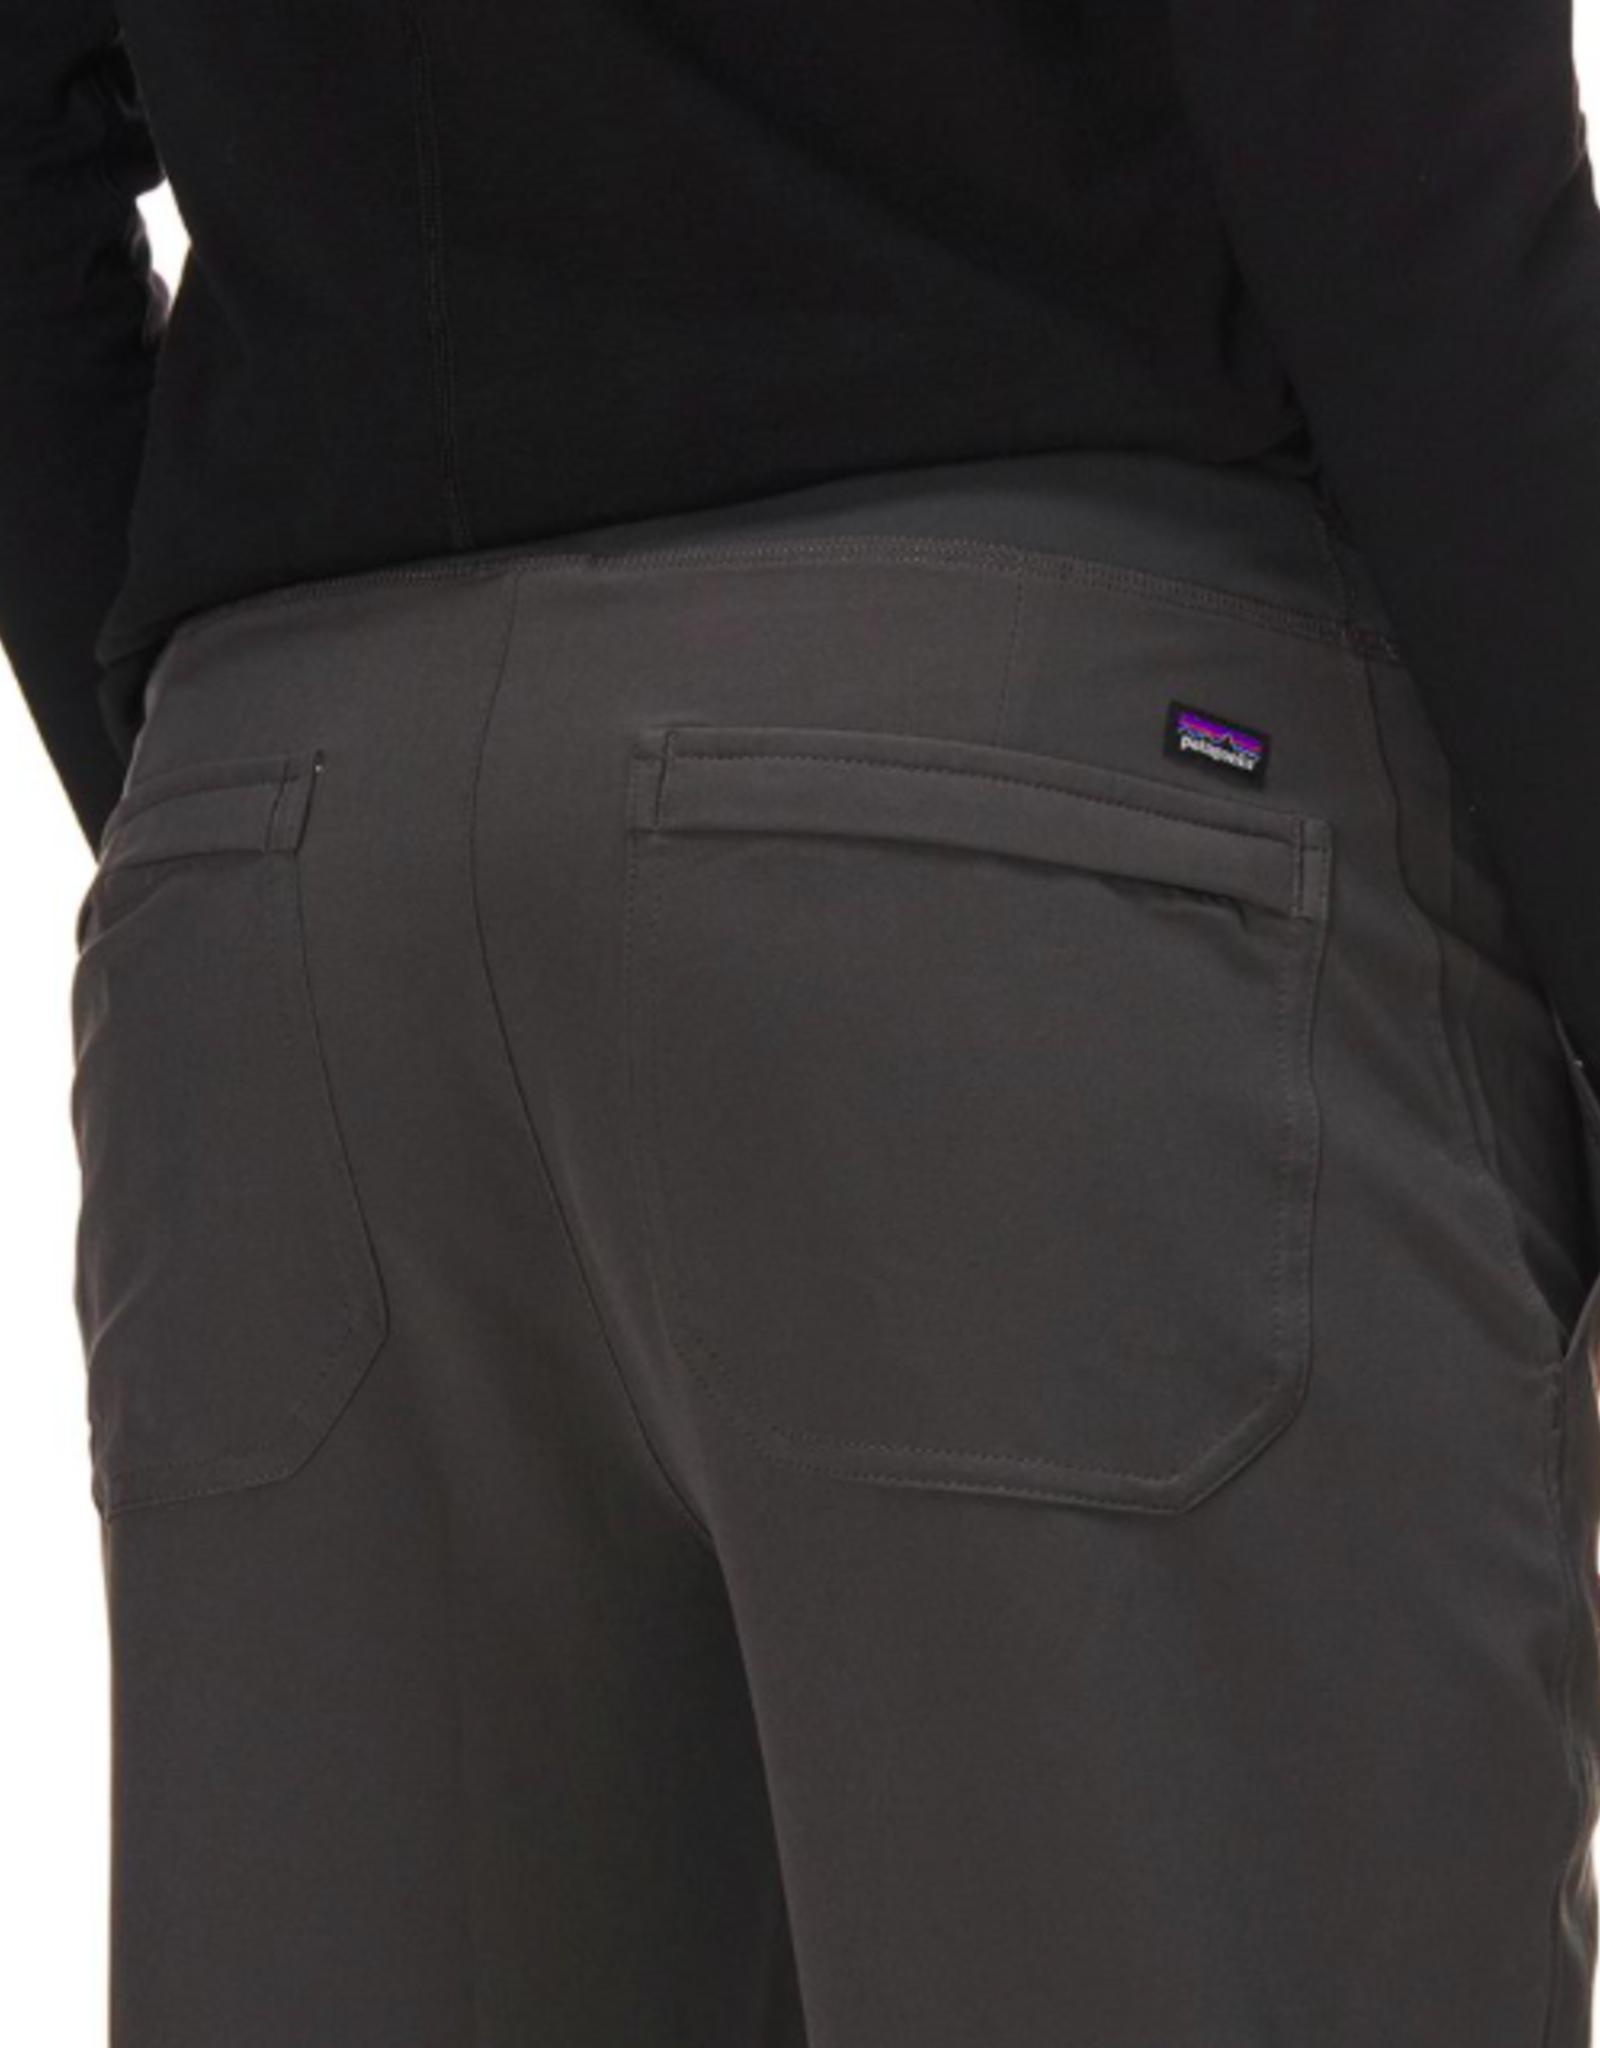 Patagonia W's Lined Happy Hike Studio Pants